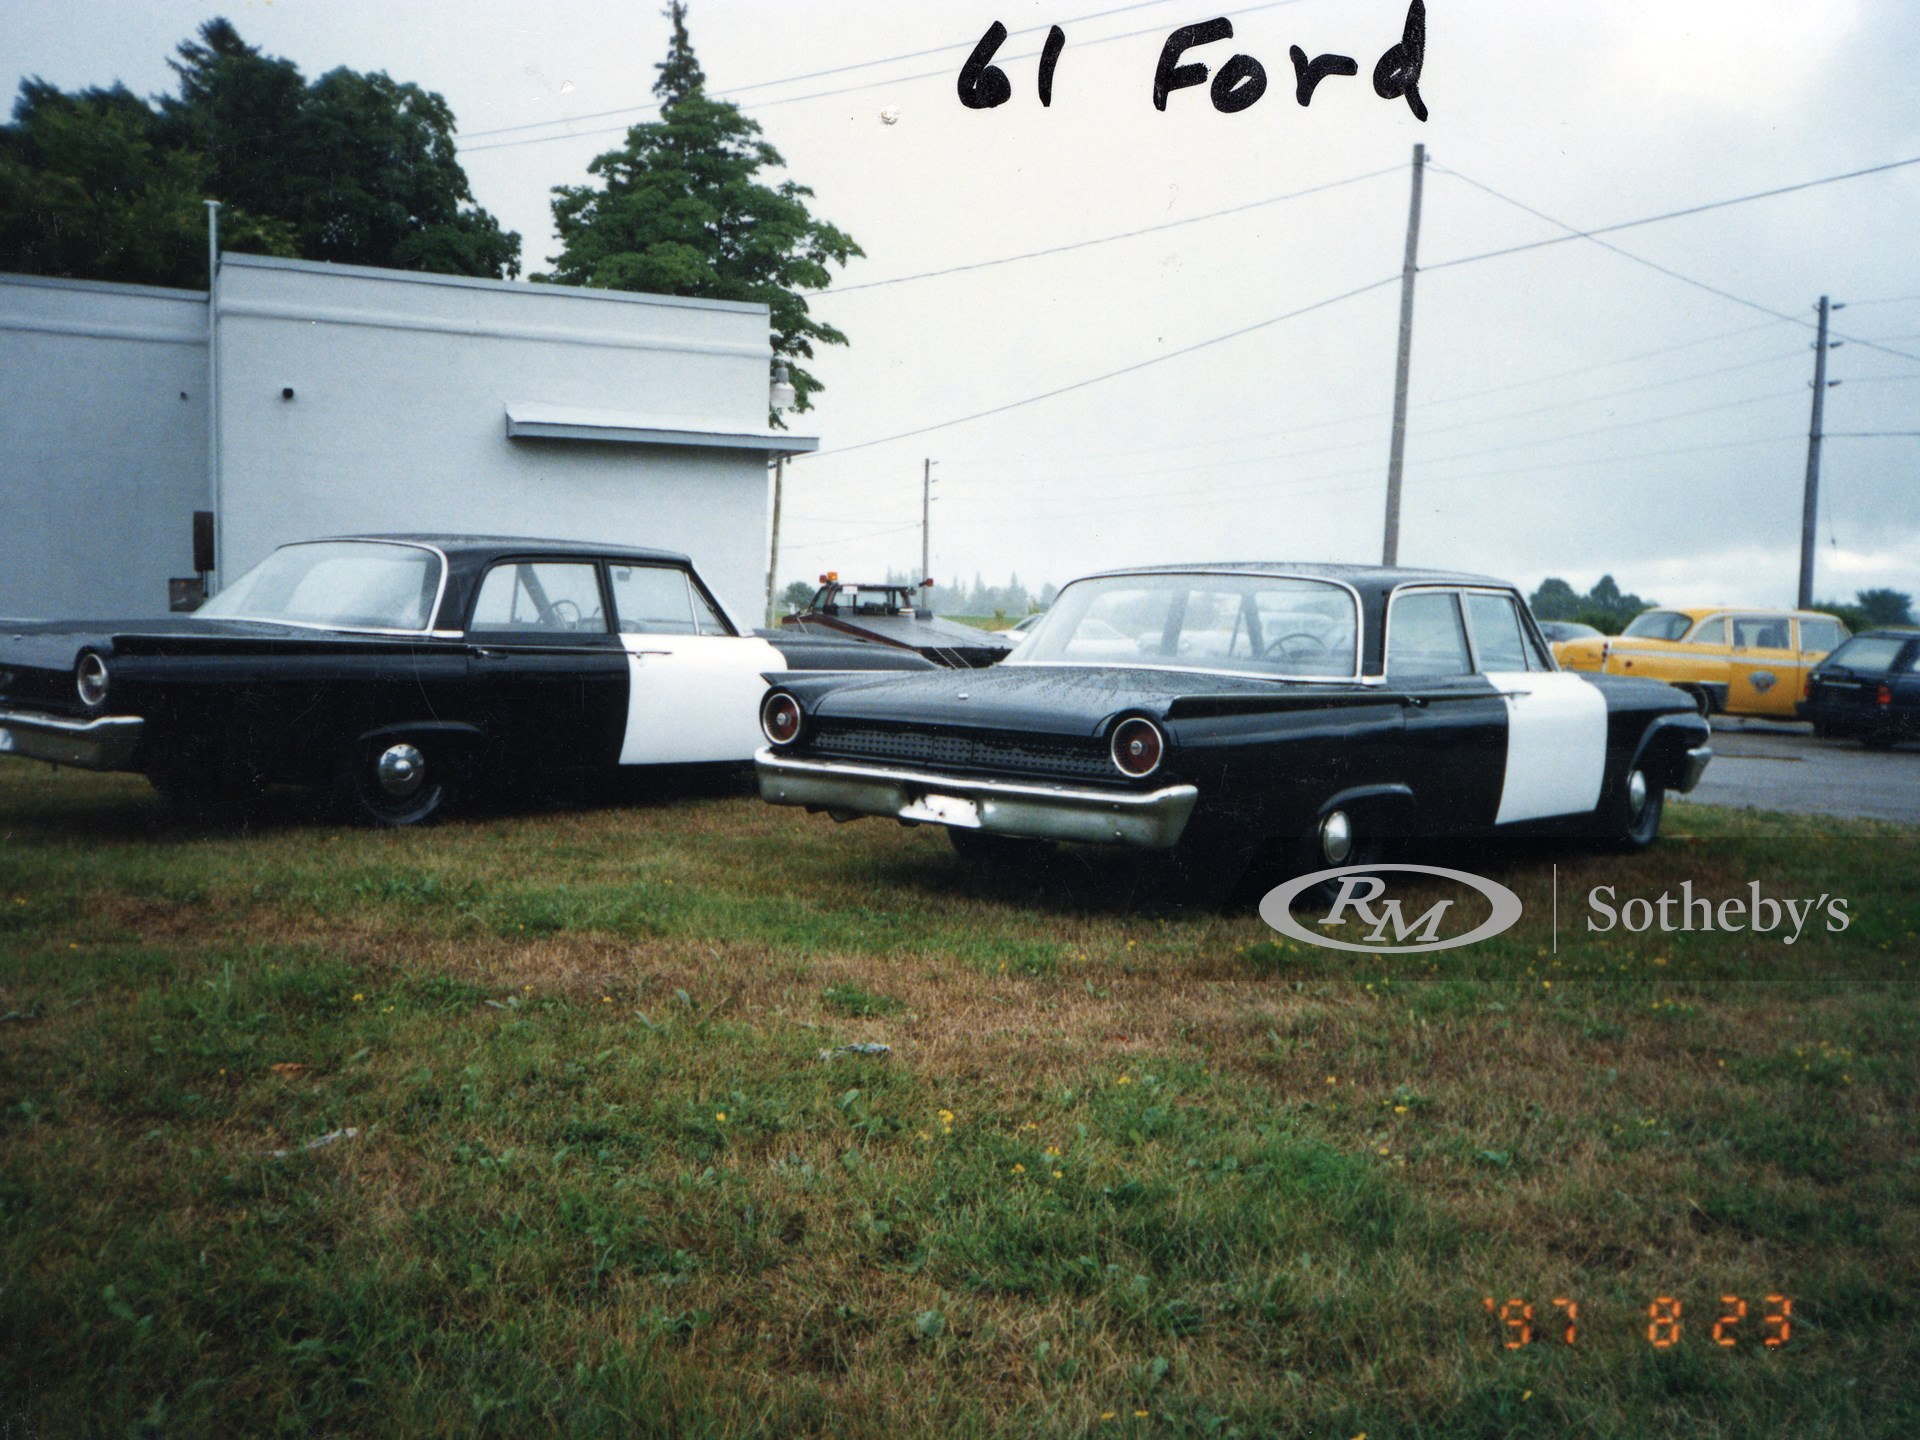 1961 Ford Galaxie Sedan